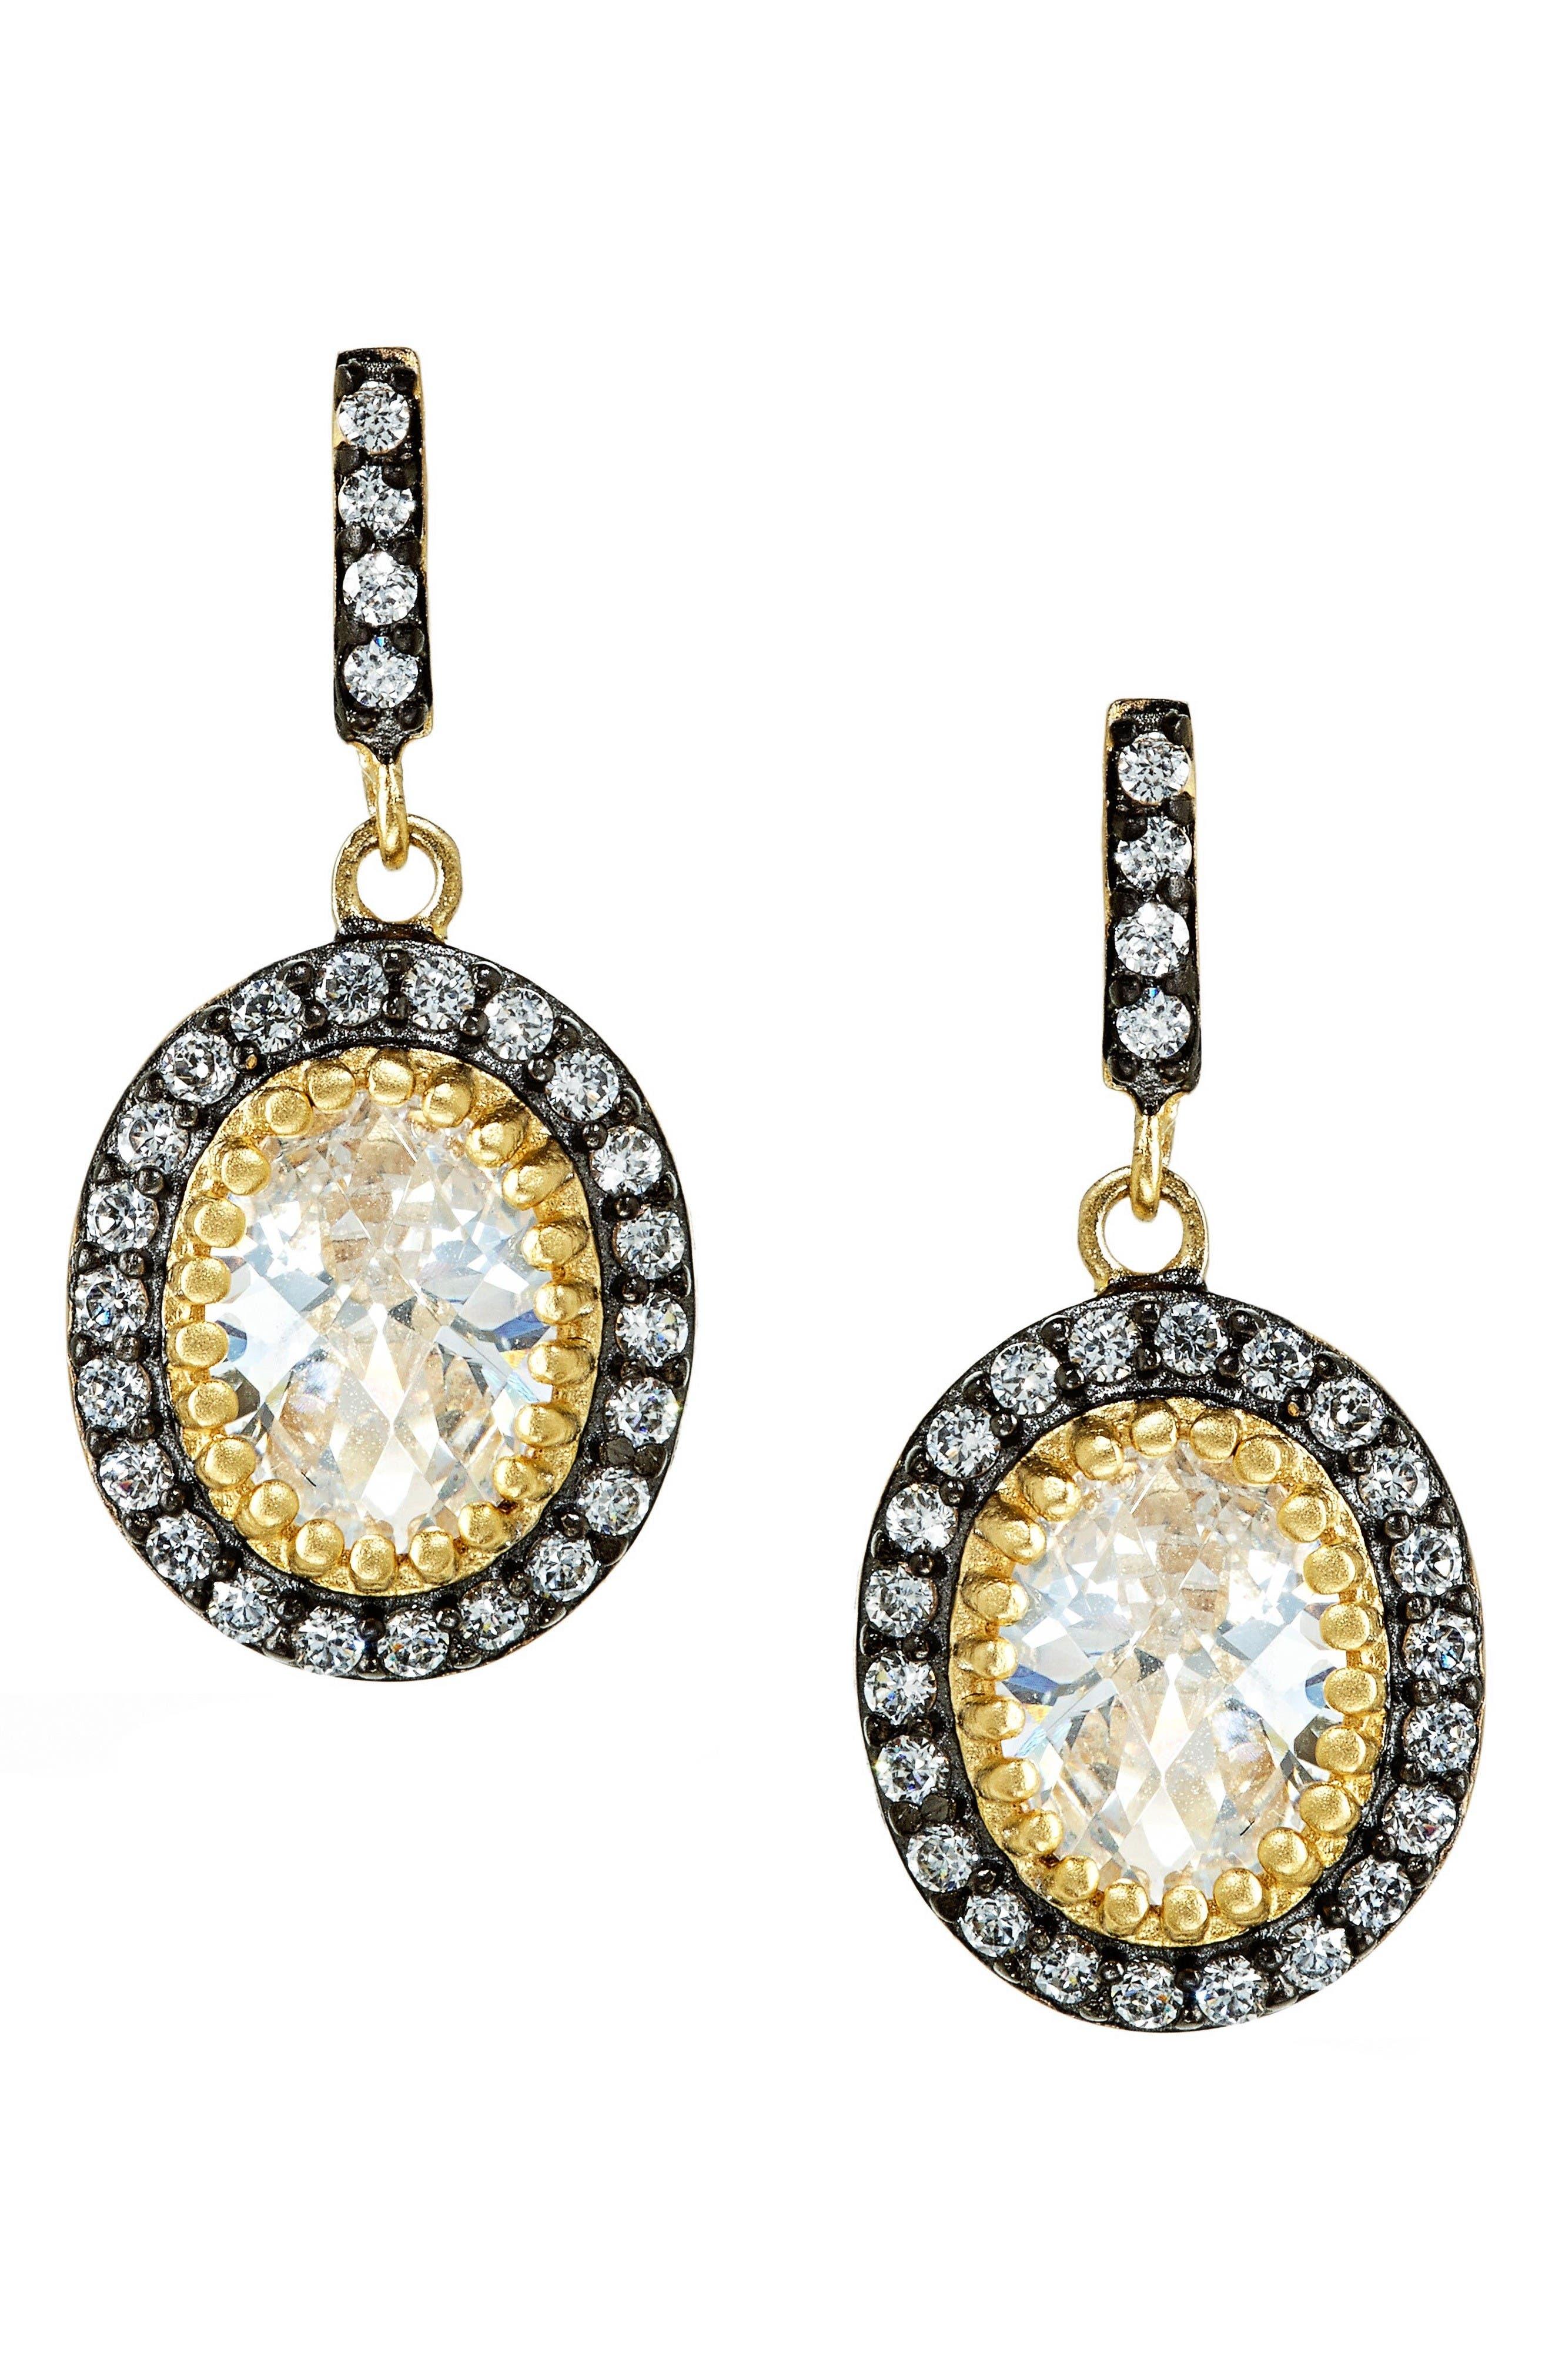 Main Image - FREIDA ROTHMAN 'Madison Avenue' Drop Earrings